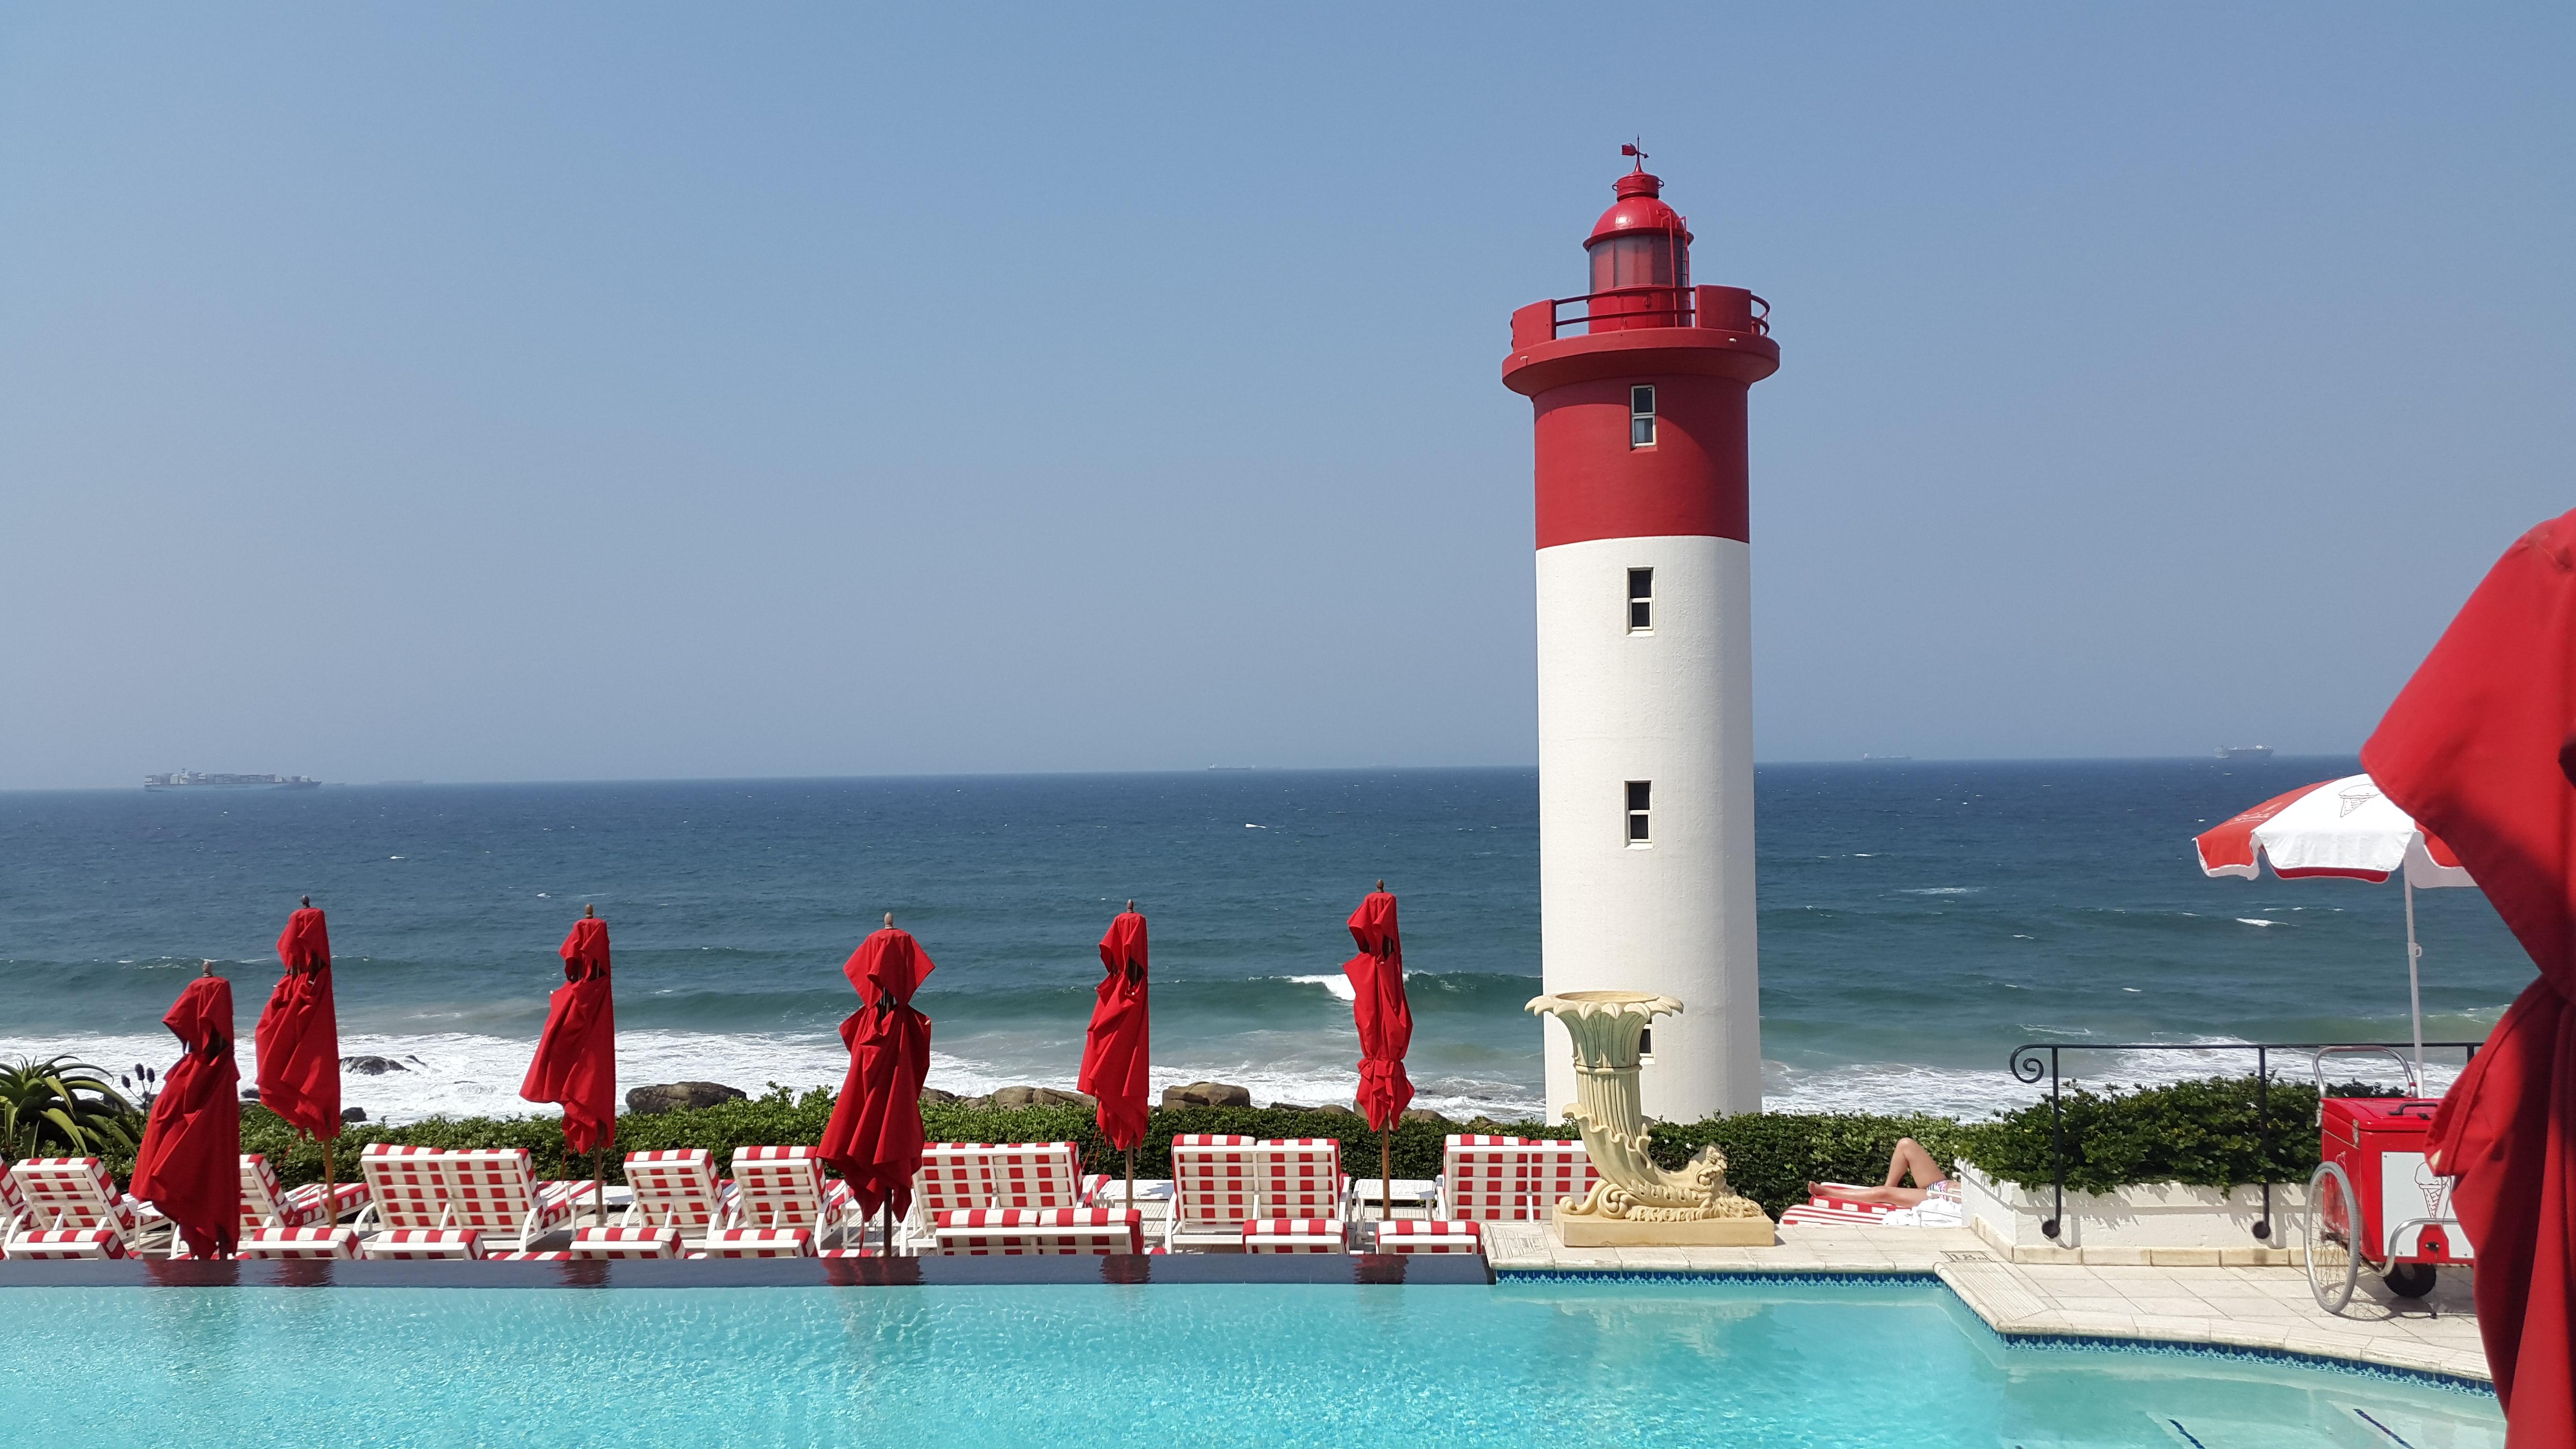 Lighthouse at Umhlanga Rocks, Durban